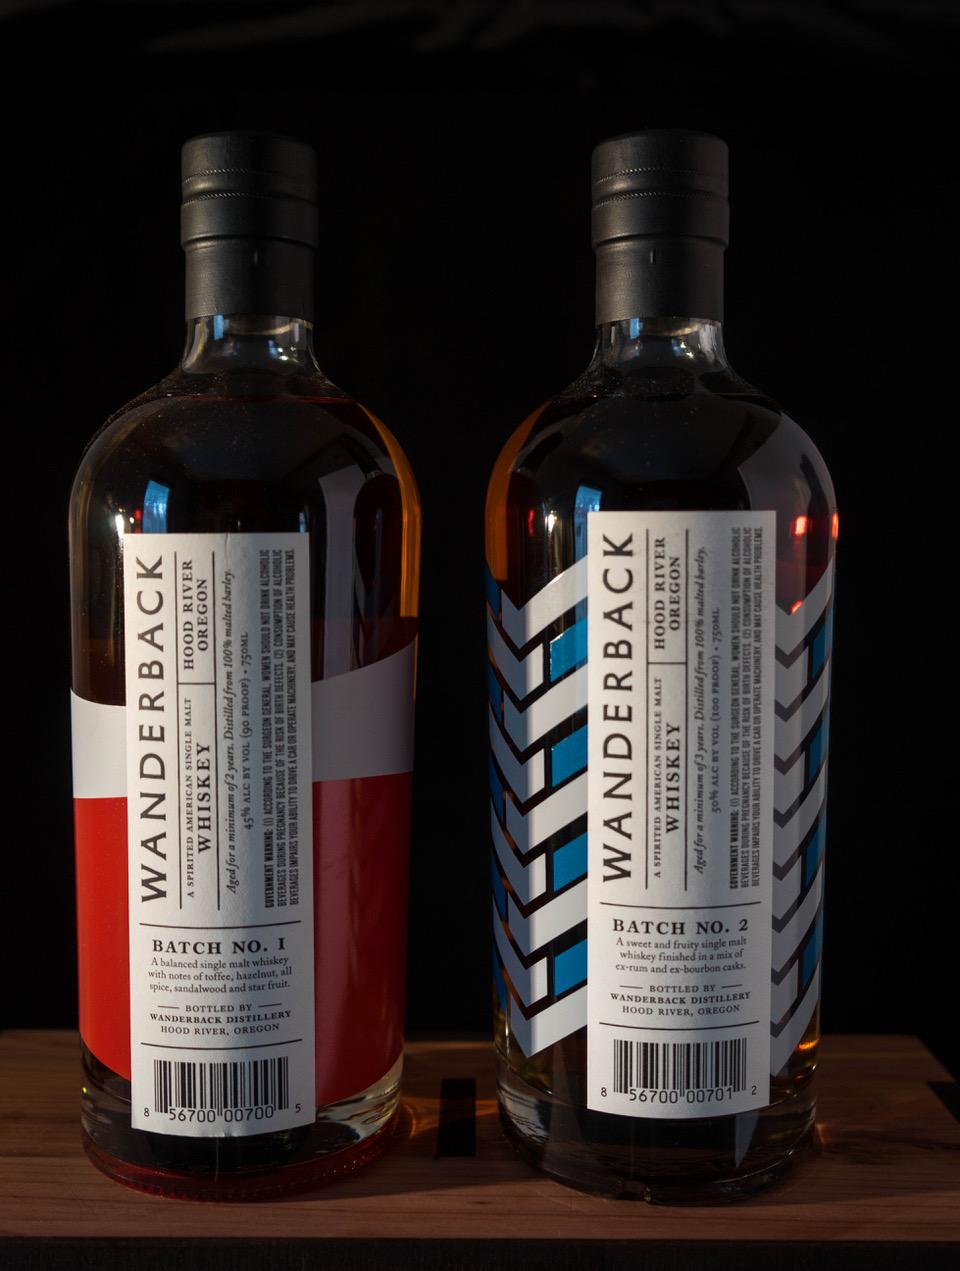 Wanderback Whiskey American Single Malt